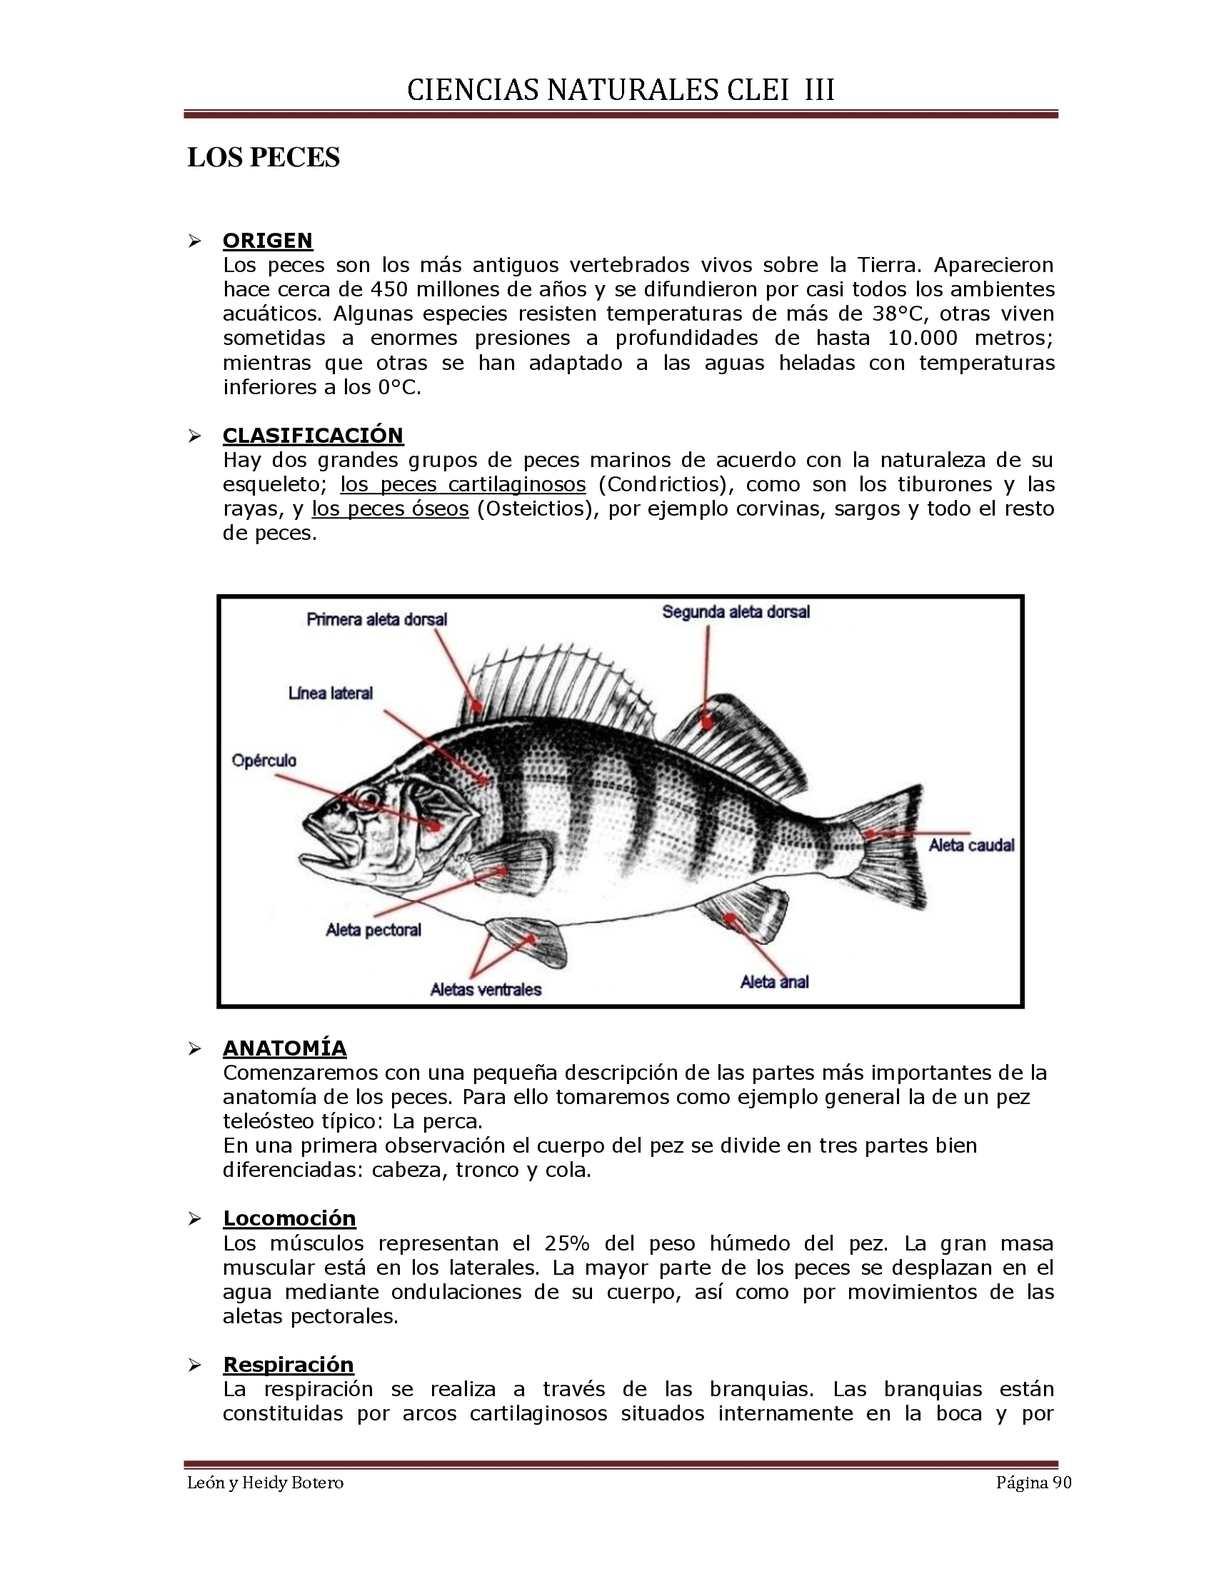 CIENCIAS NATURALES CLEI III - CALAMEO Downloader